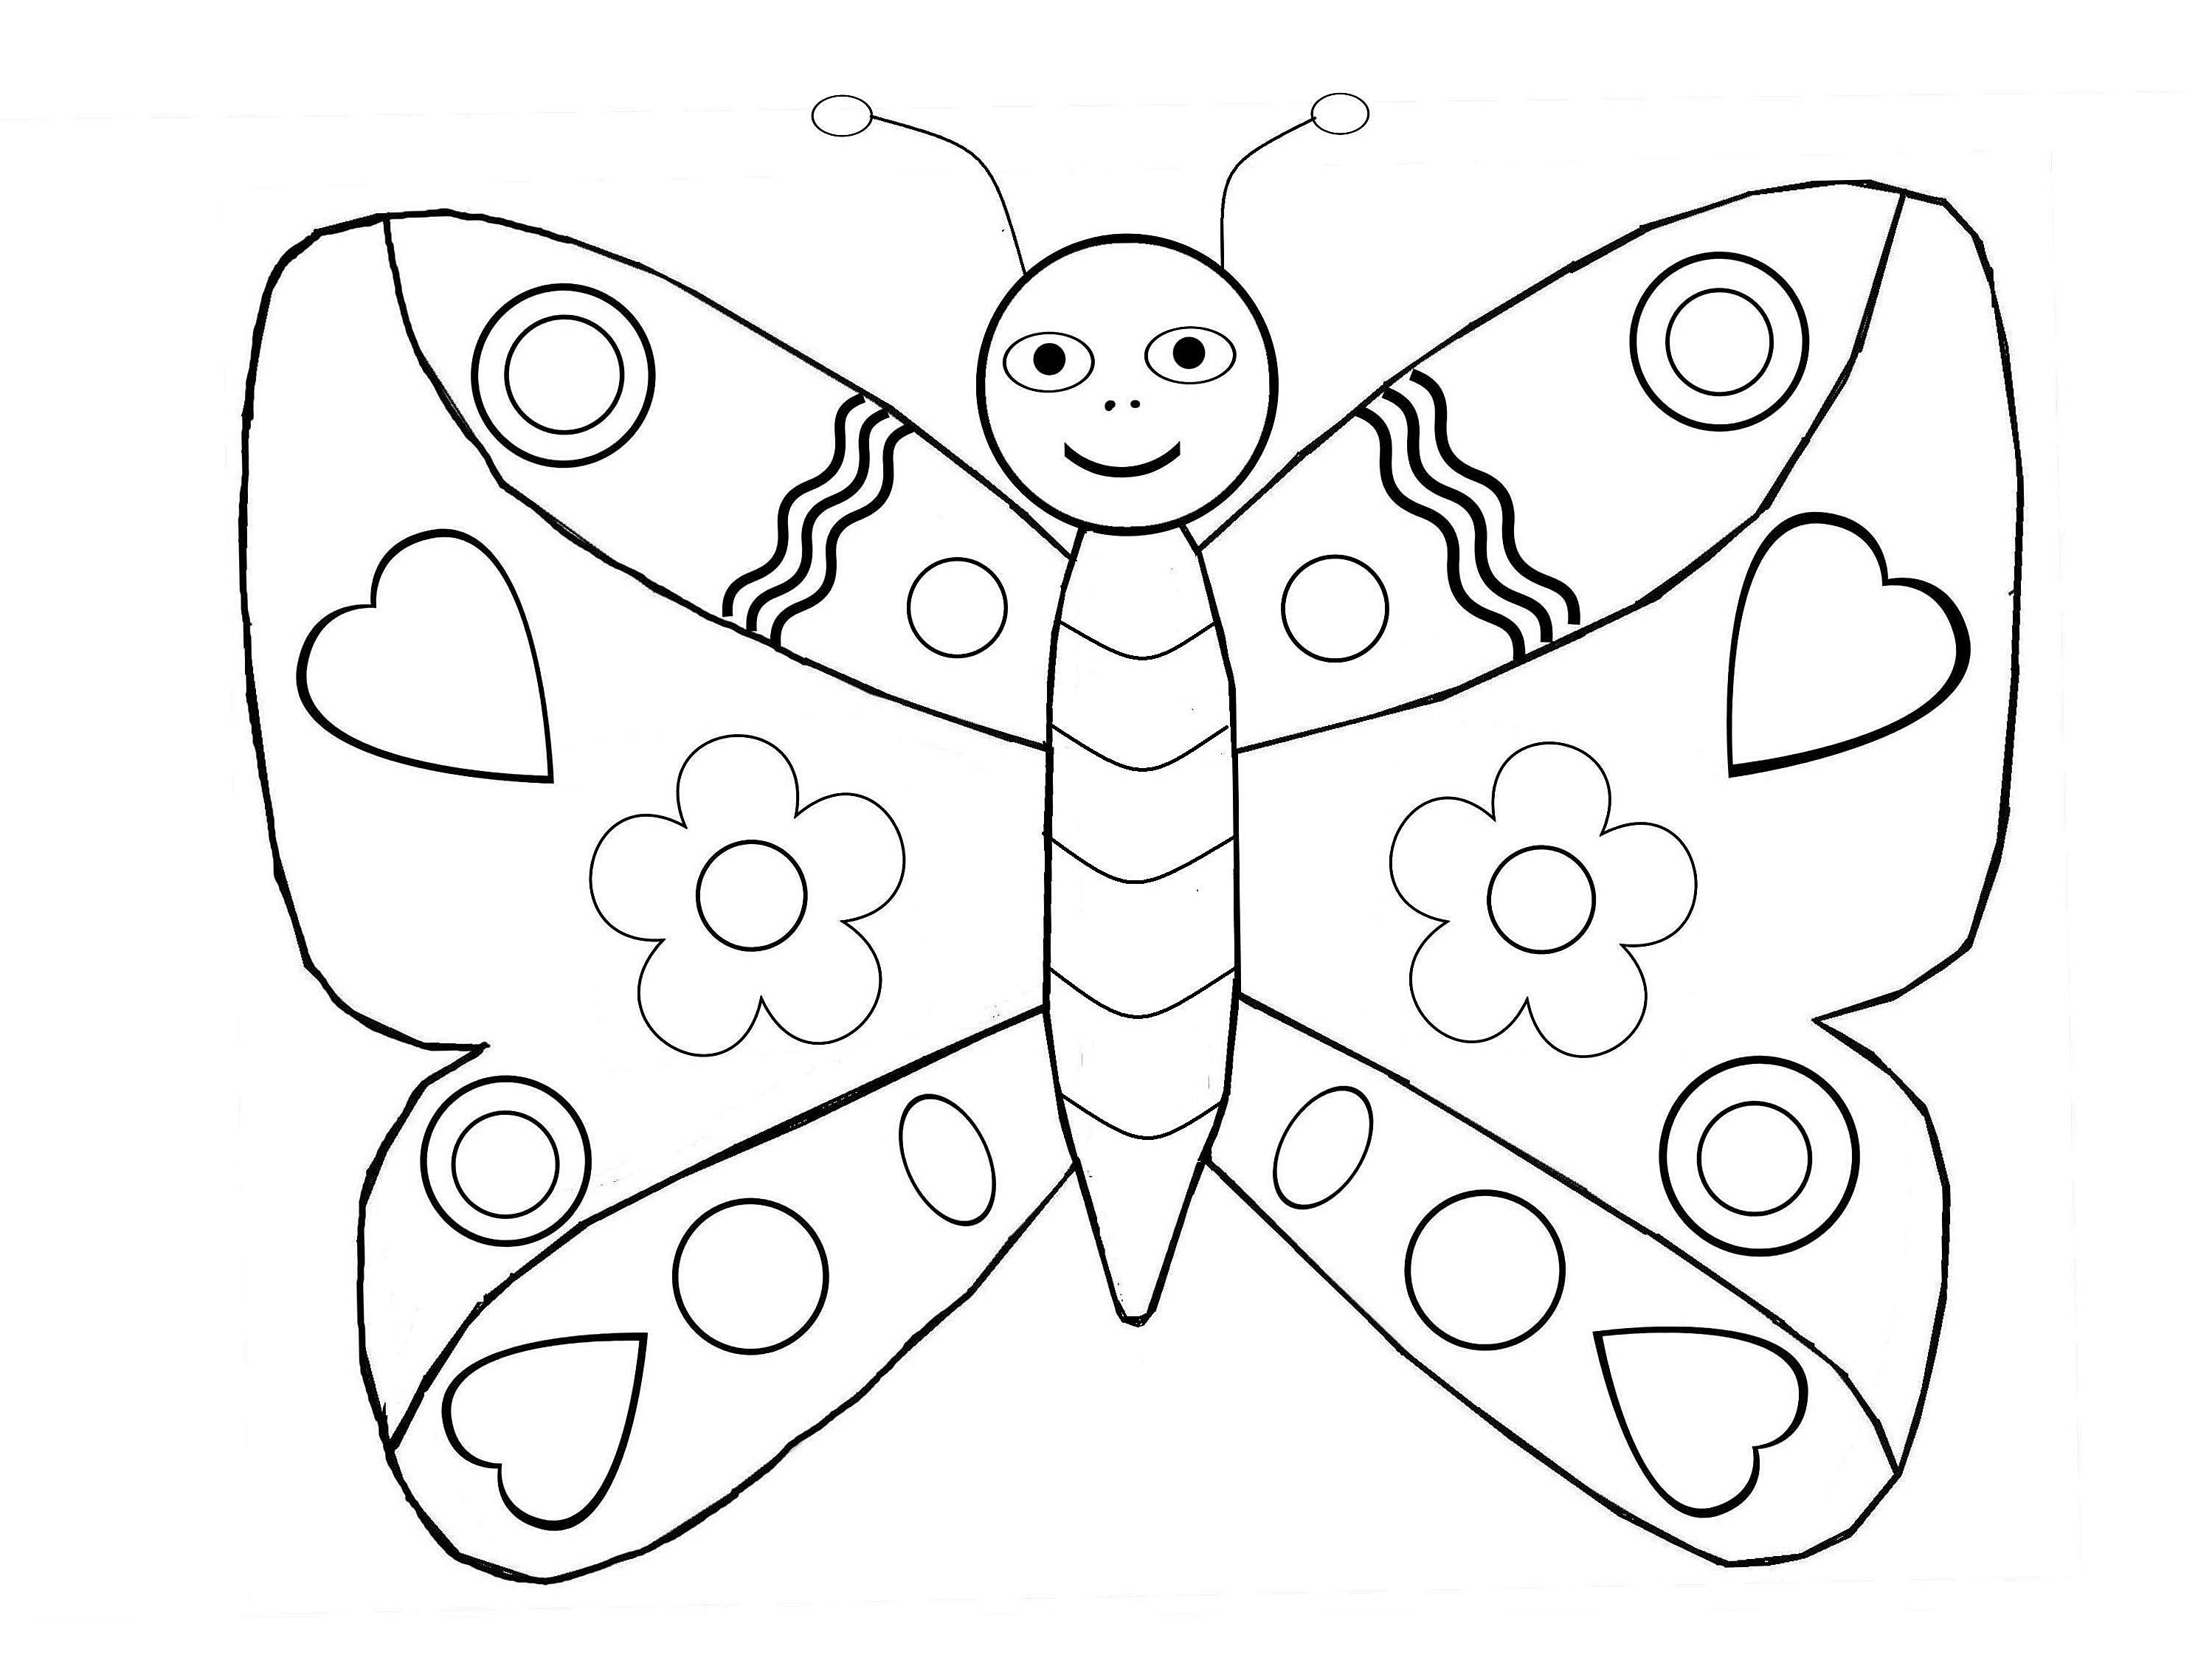 97 dessins de coloriage insectes gratuit imprimer - Des dessins a imprimer ...